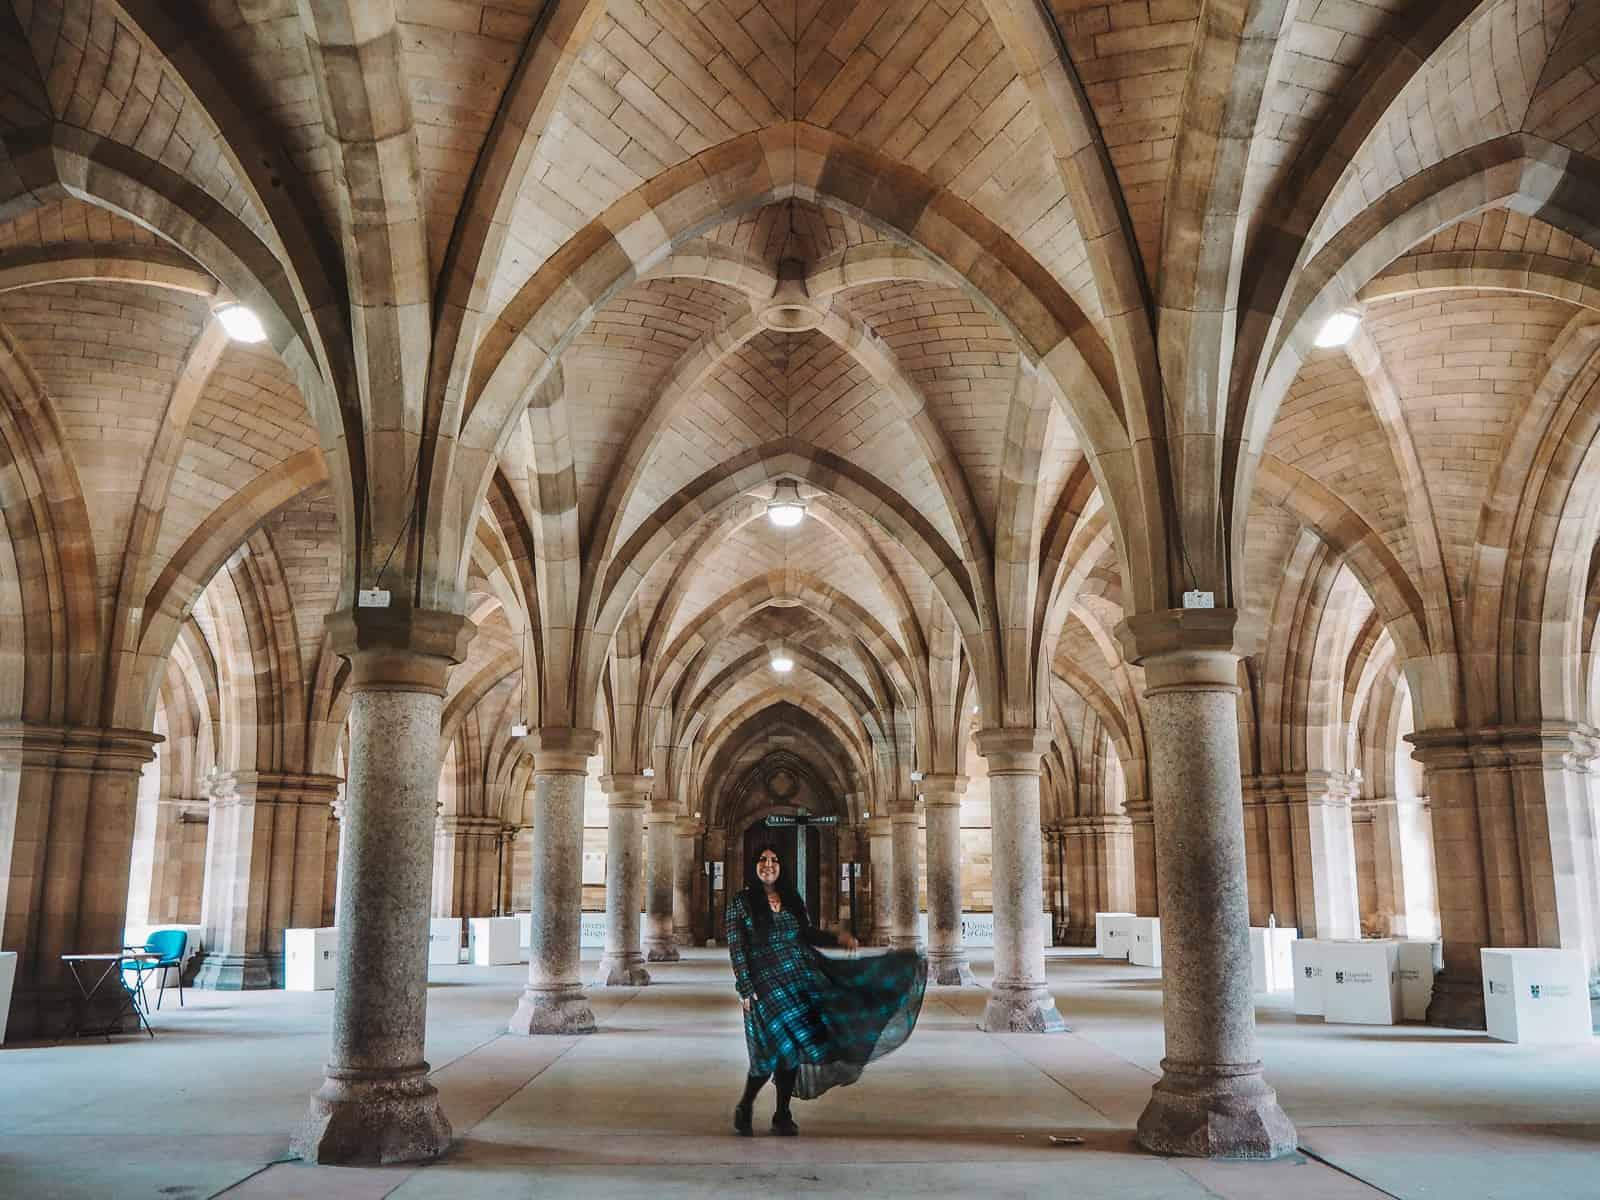 University of Glasgow Outlander location as Havard University Boston